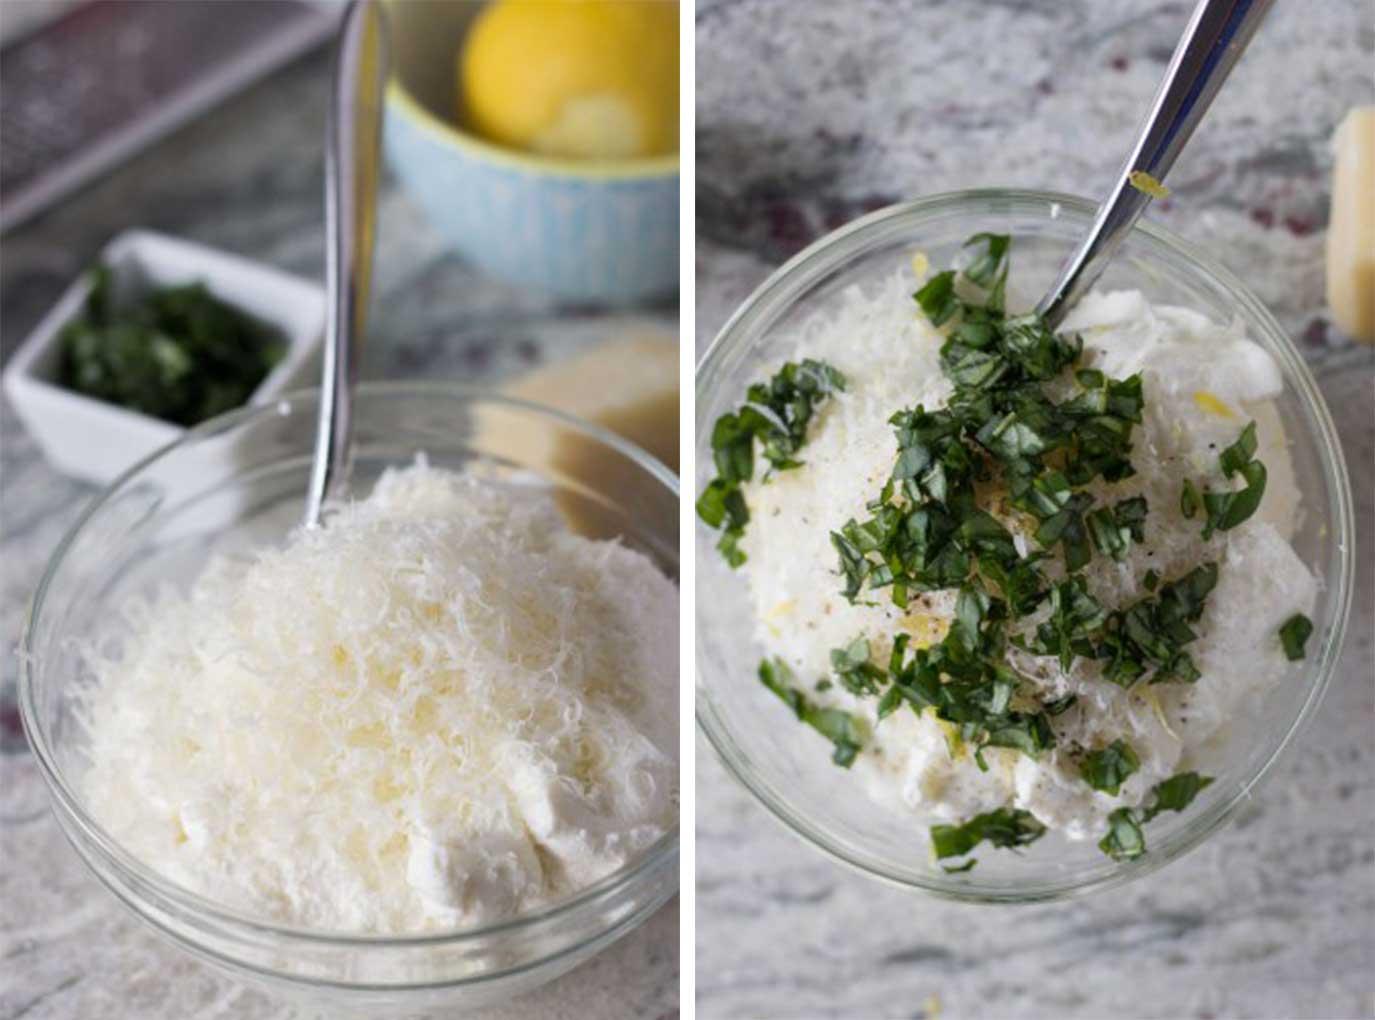 Homemade Cheese Ravioli - ricotta filling